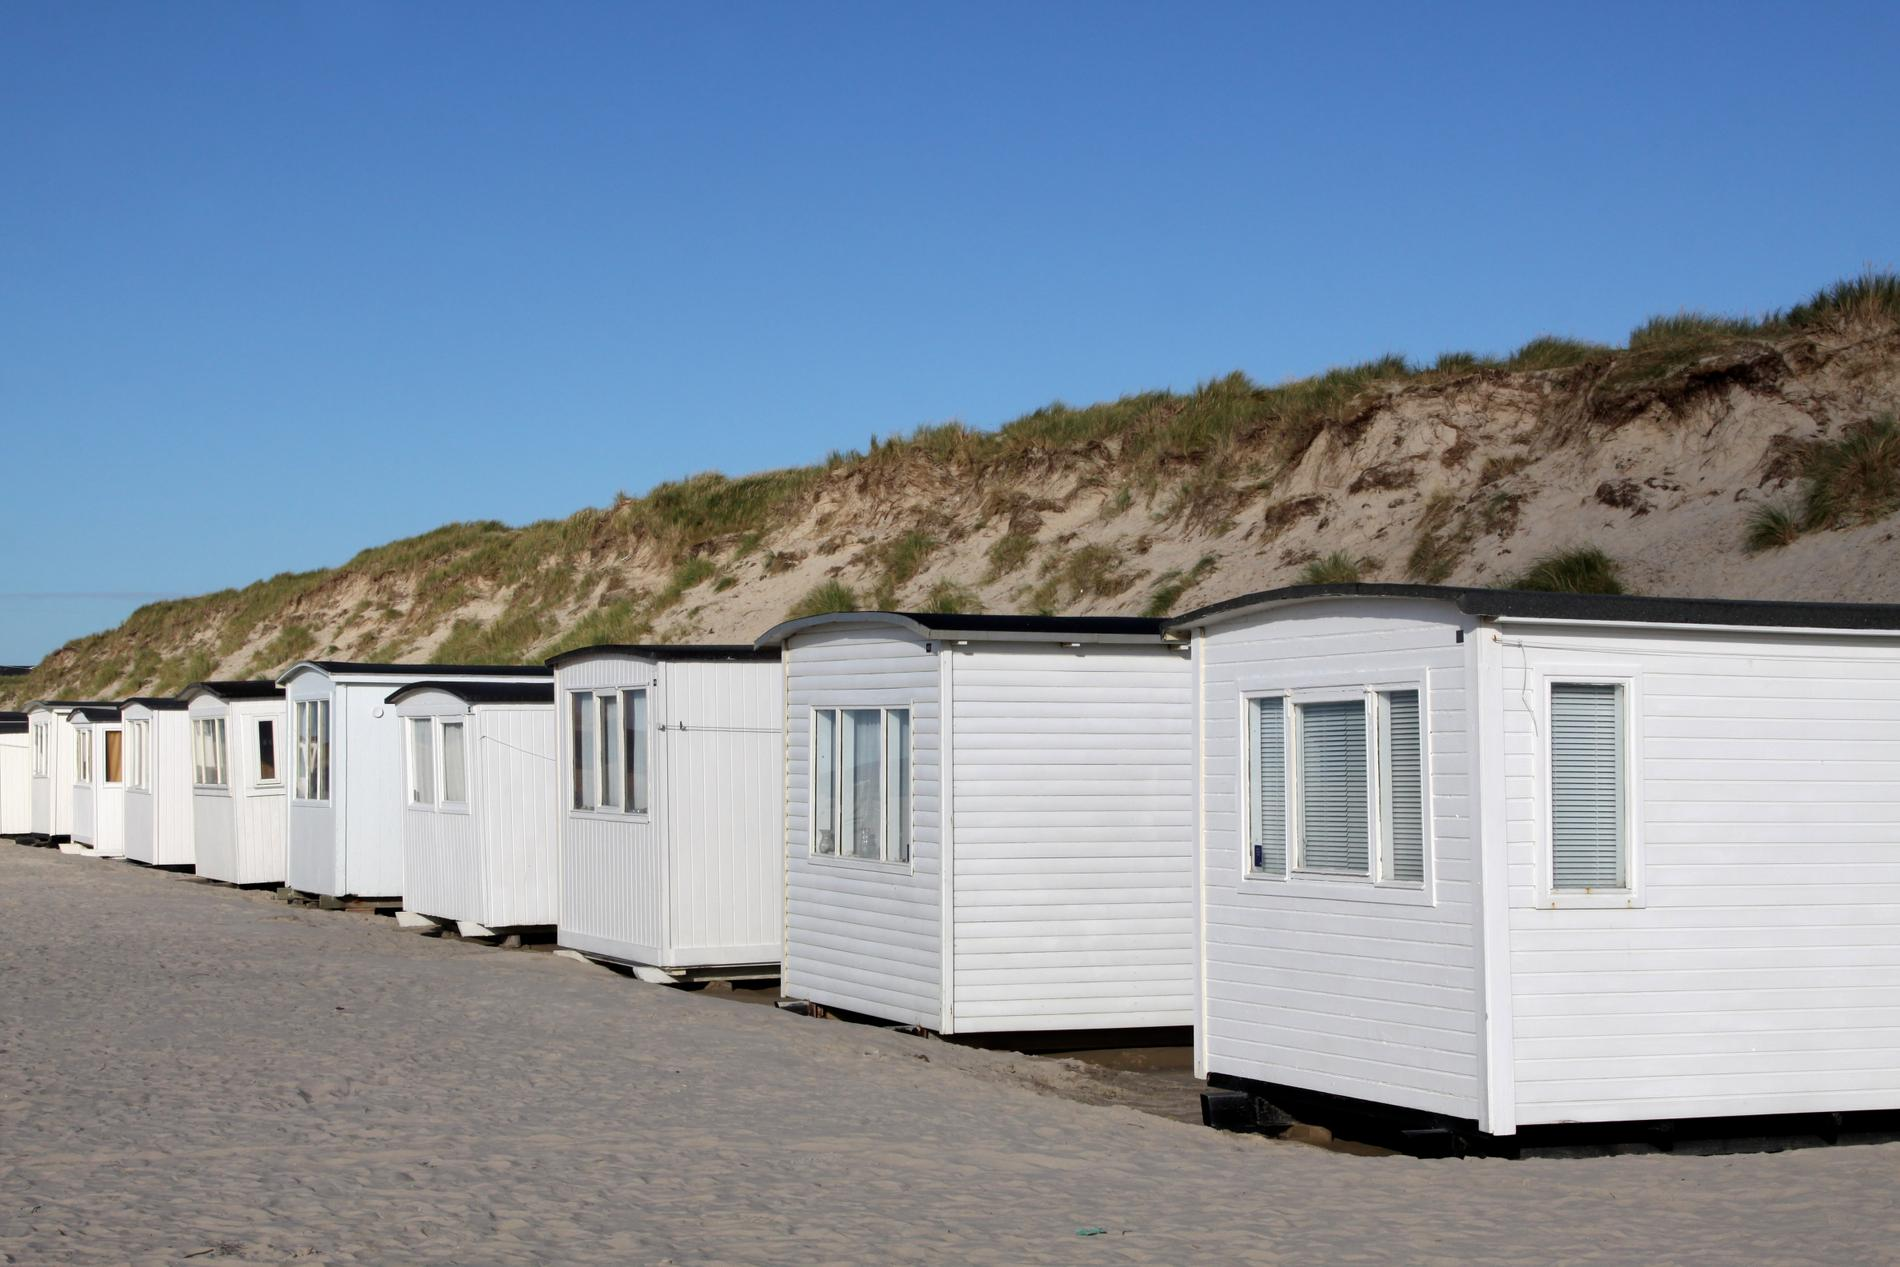 På Løkken strand vittnar badhytterna om en gammal badtradition i området.